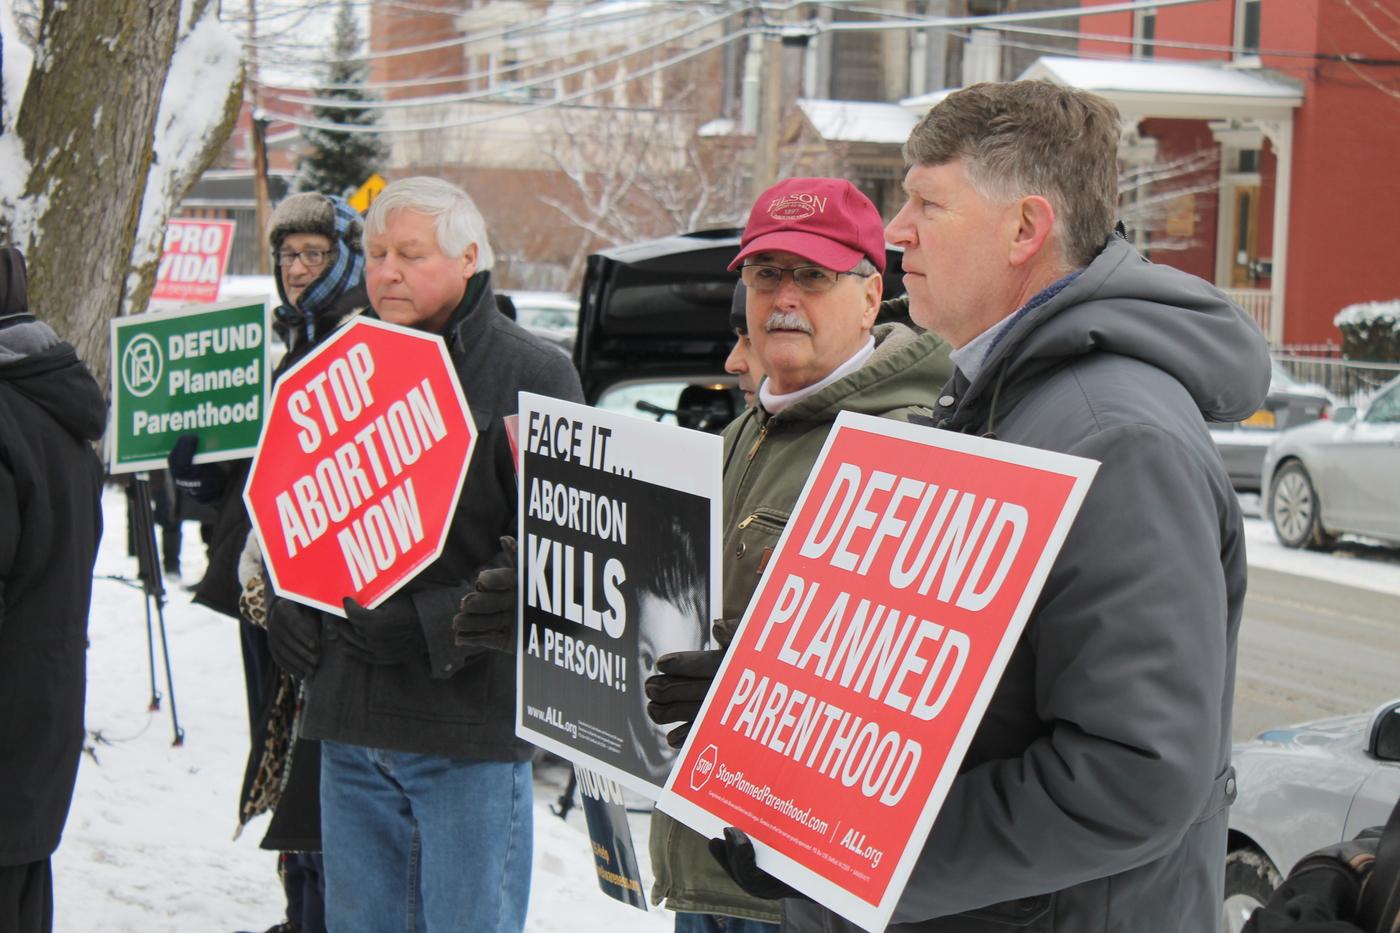 DC anti-abortion activists protest Planned Parenthood